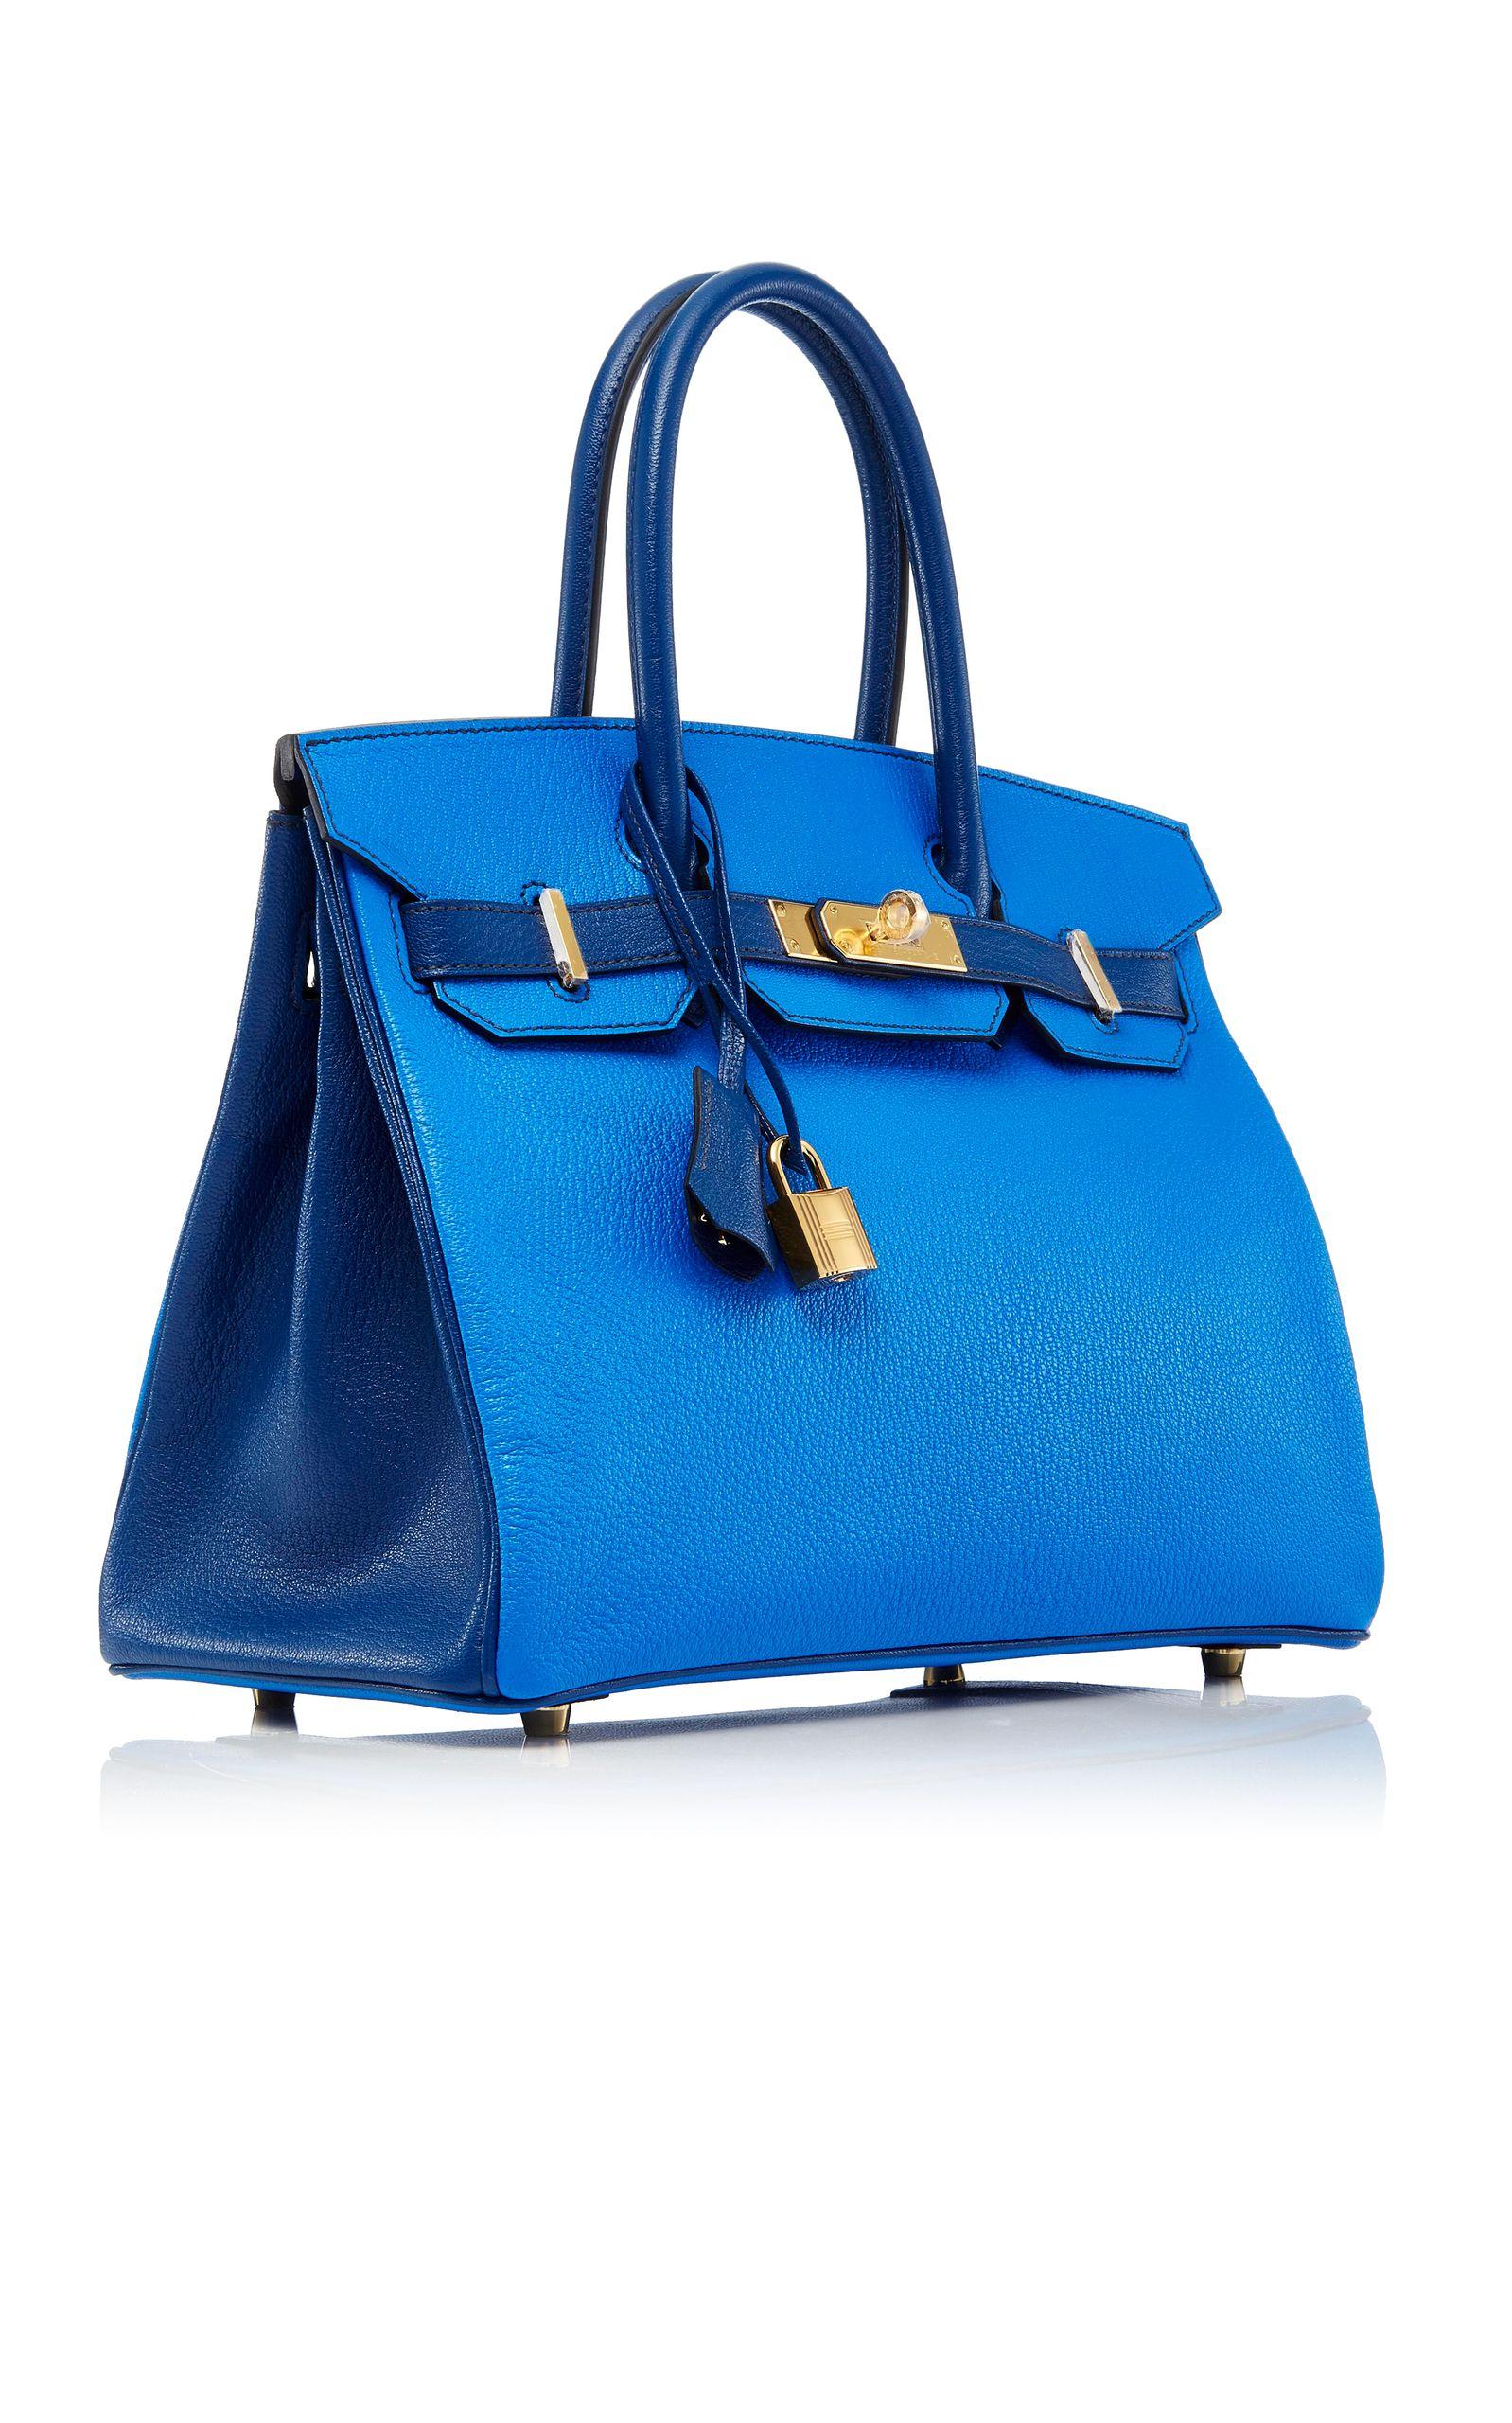 292bbe0d3ce Hermès 30Cm Blue Hydra   Blue Sapphir Chevre Leather Special Order  Horseshoe Birkin